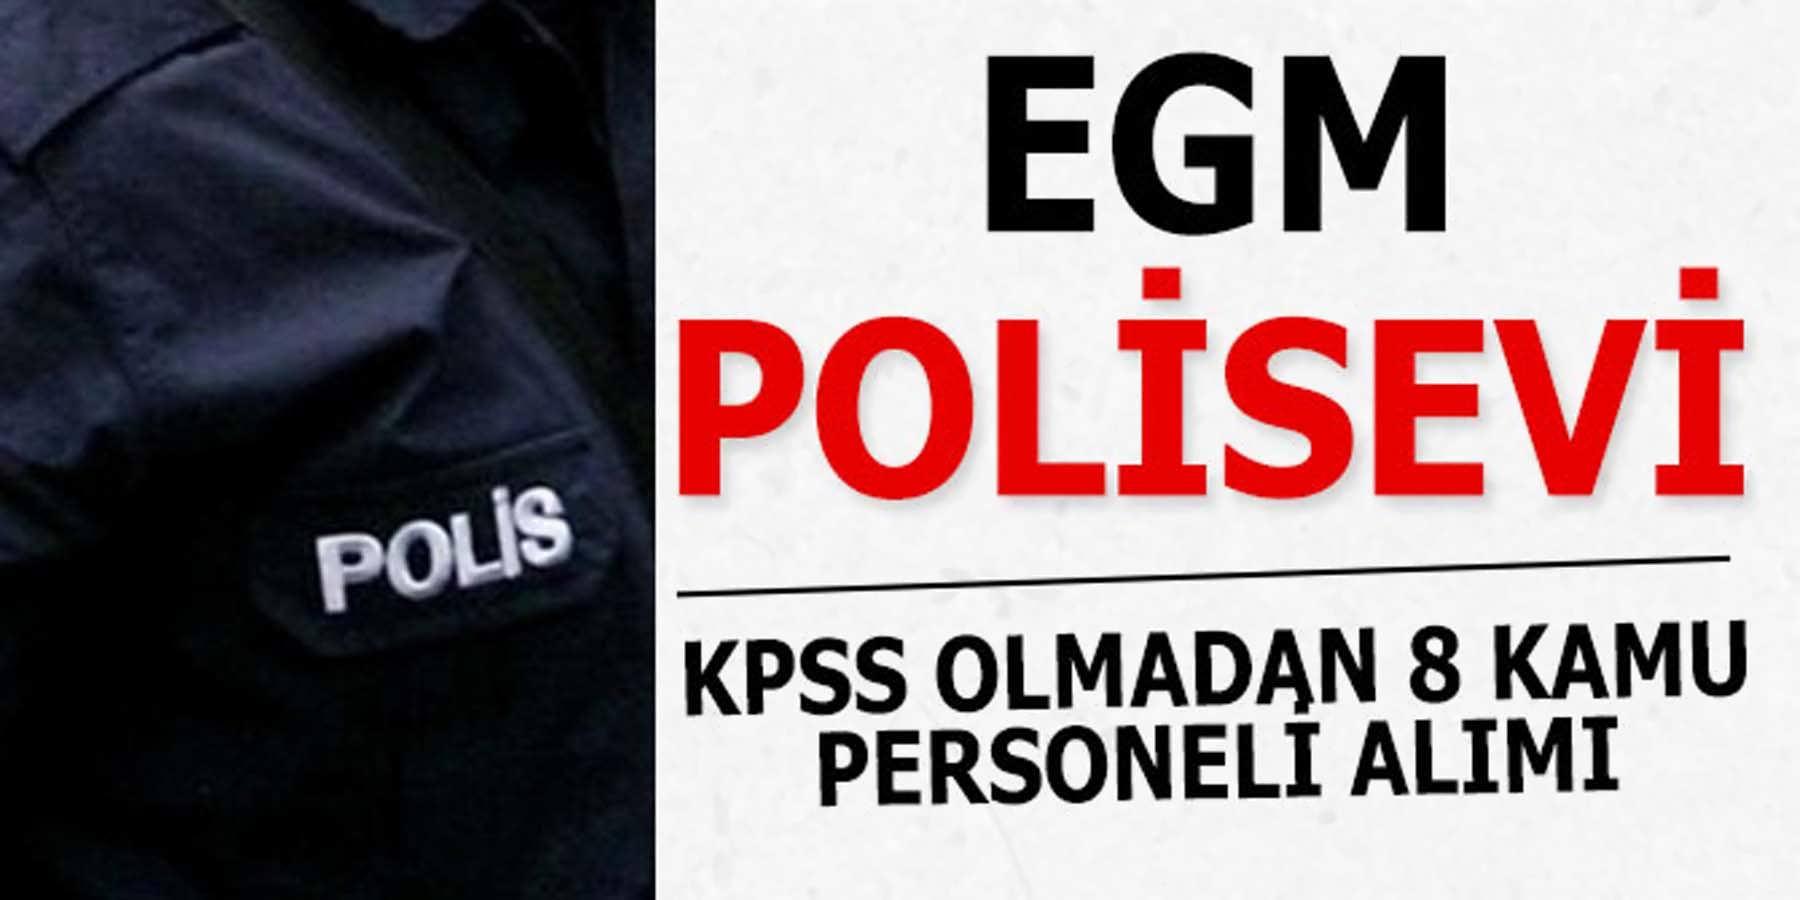 EGM Polisevi KPSS Olmadan 8 Kamu Personeli Alımı